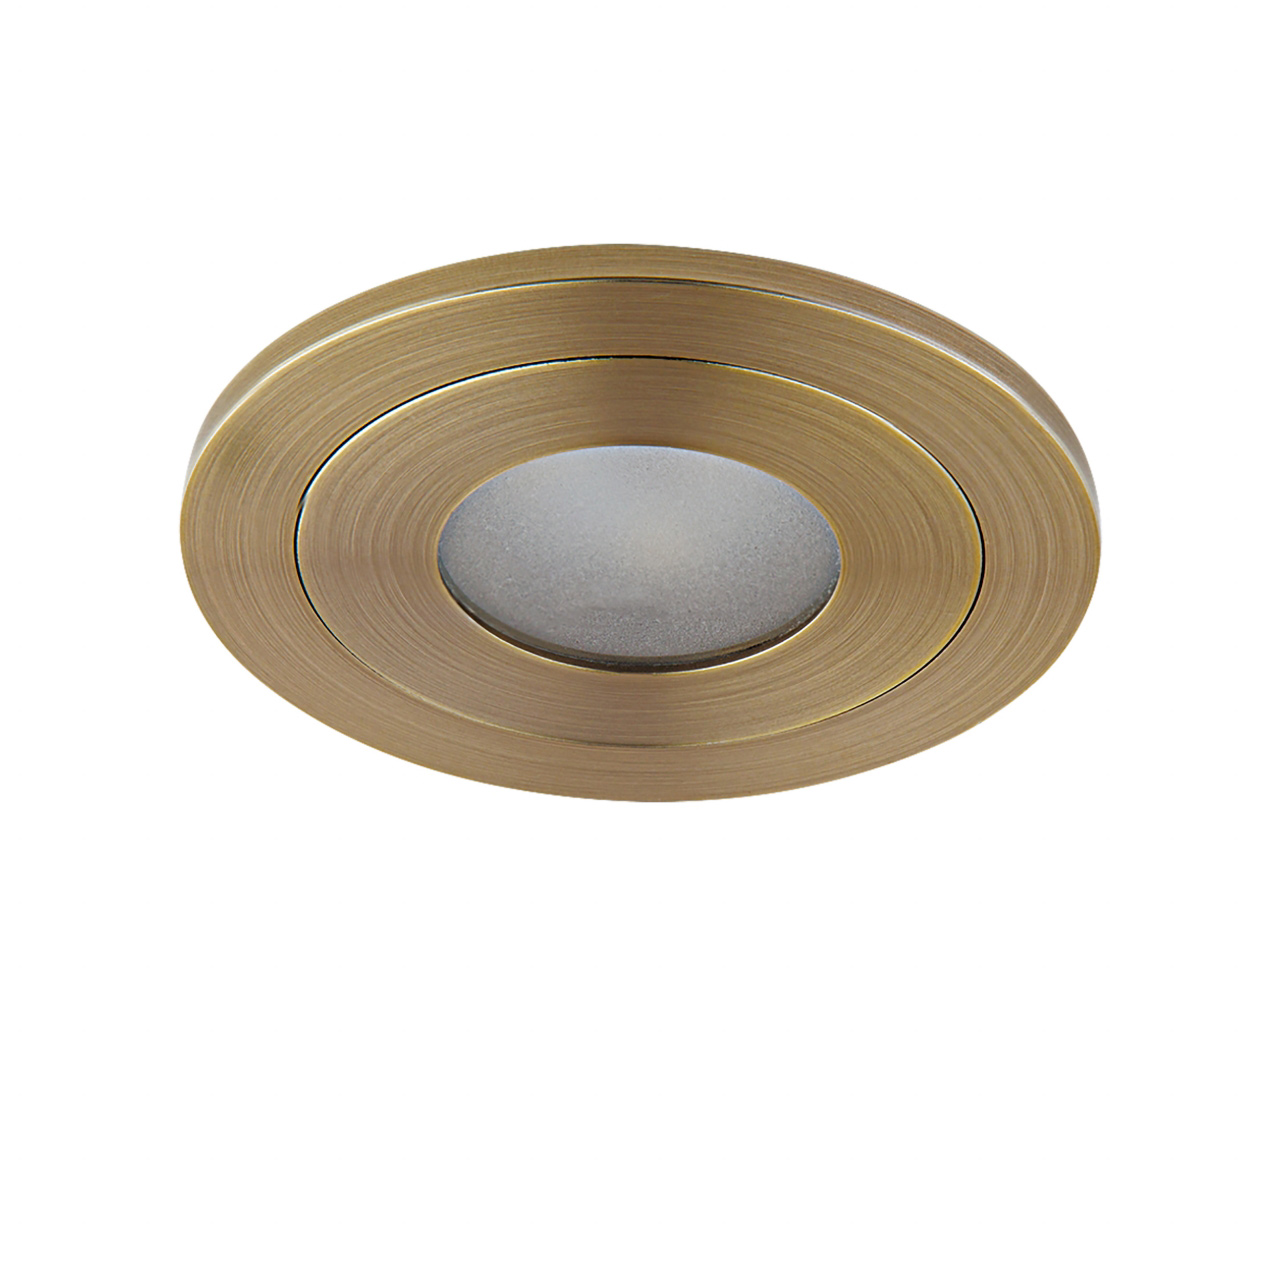 Светильник Leddy cyl LED 3W 240LM бронза зеленая 3000K Lightstar 212172